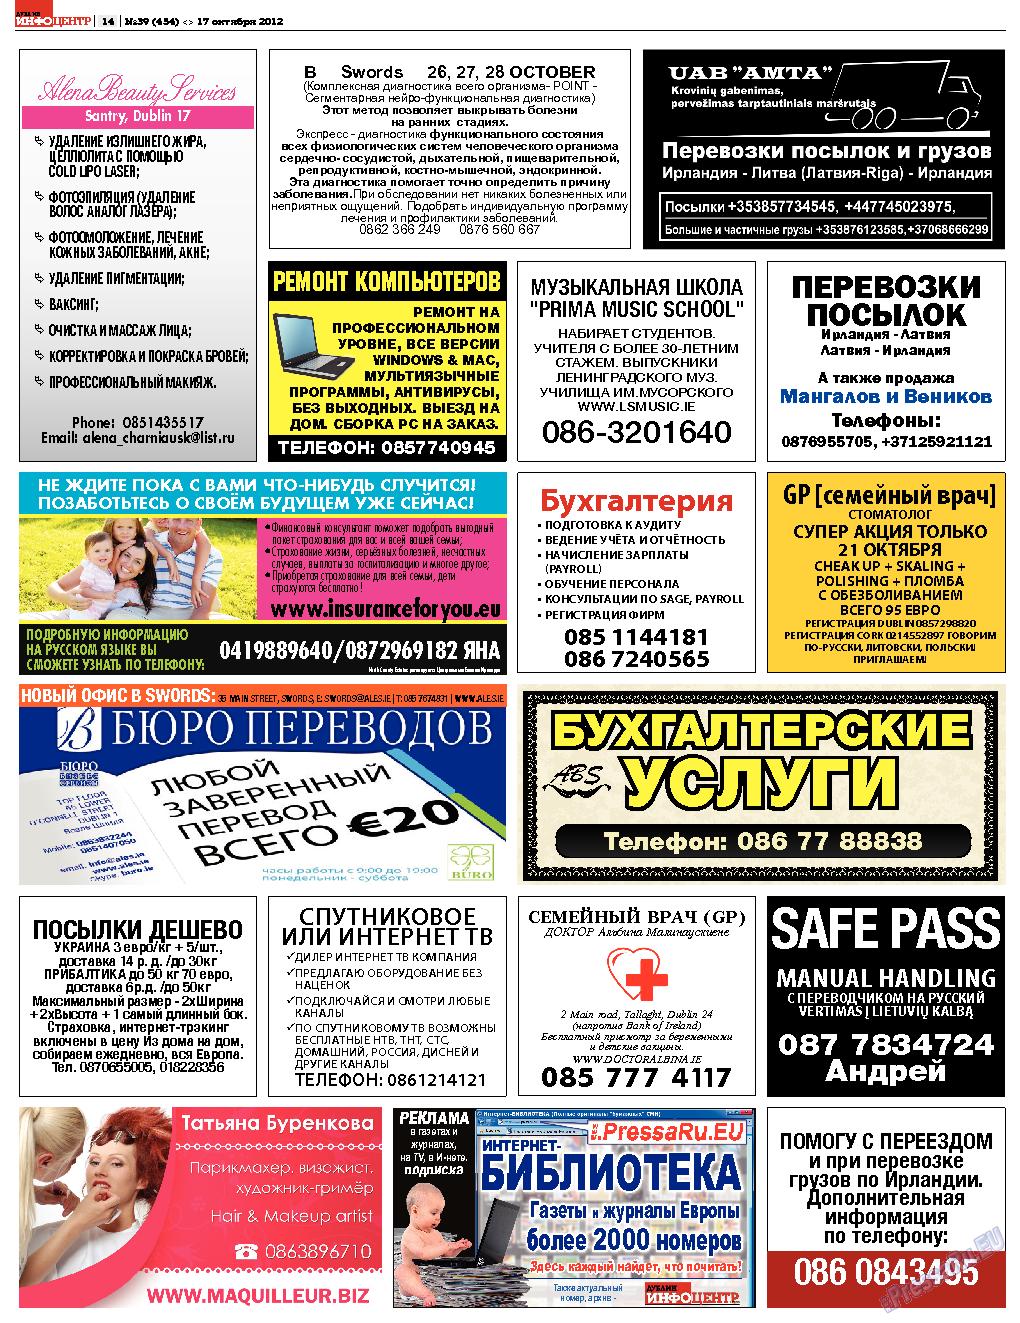 Дублин инфоцентр (газета). 2012 год, номер 38, стр. 14